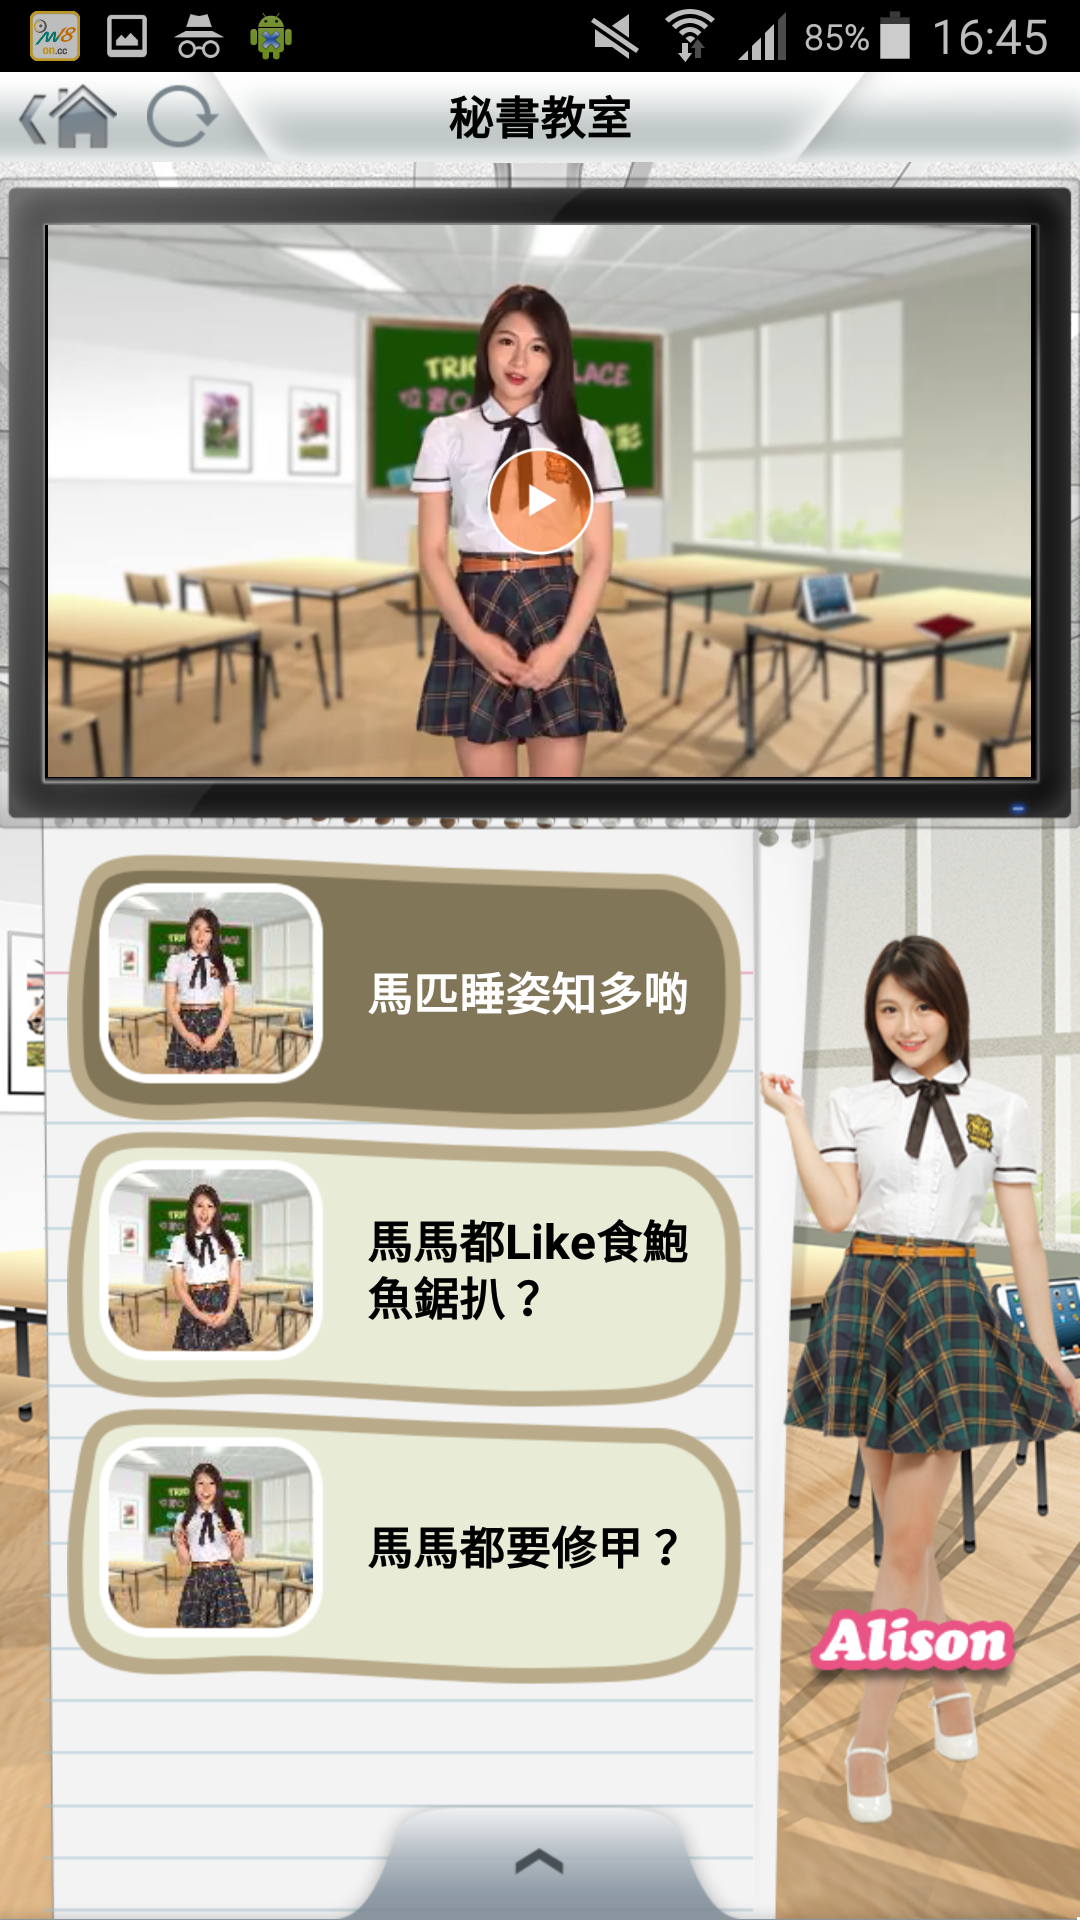 Amazon.co.jp: 馬場Boss: Andro...